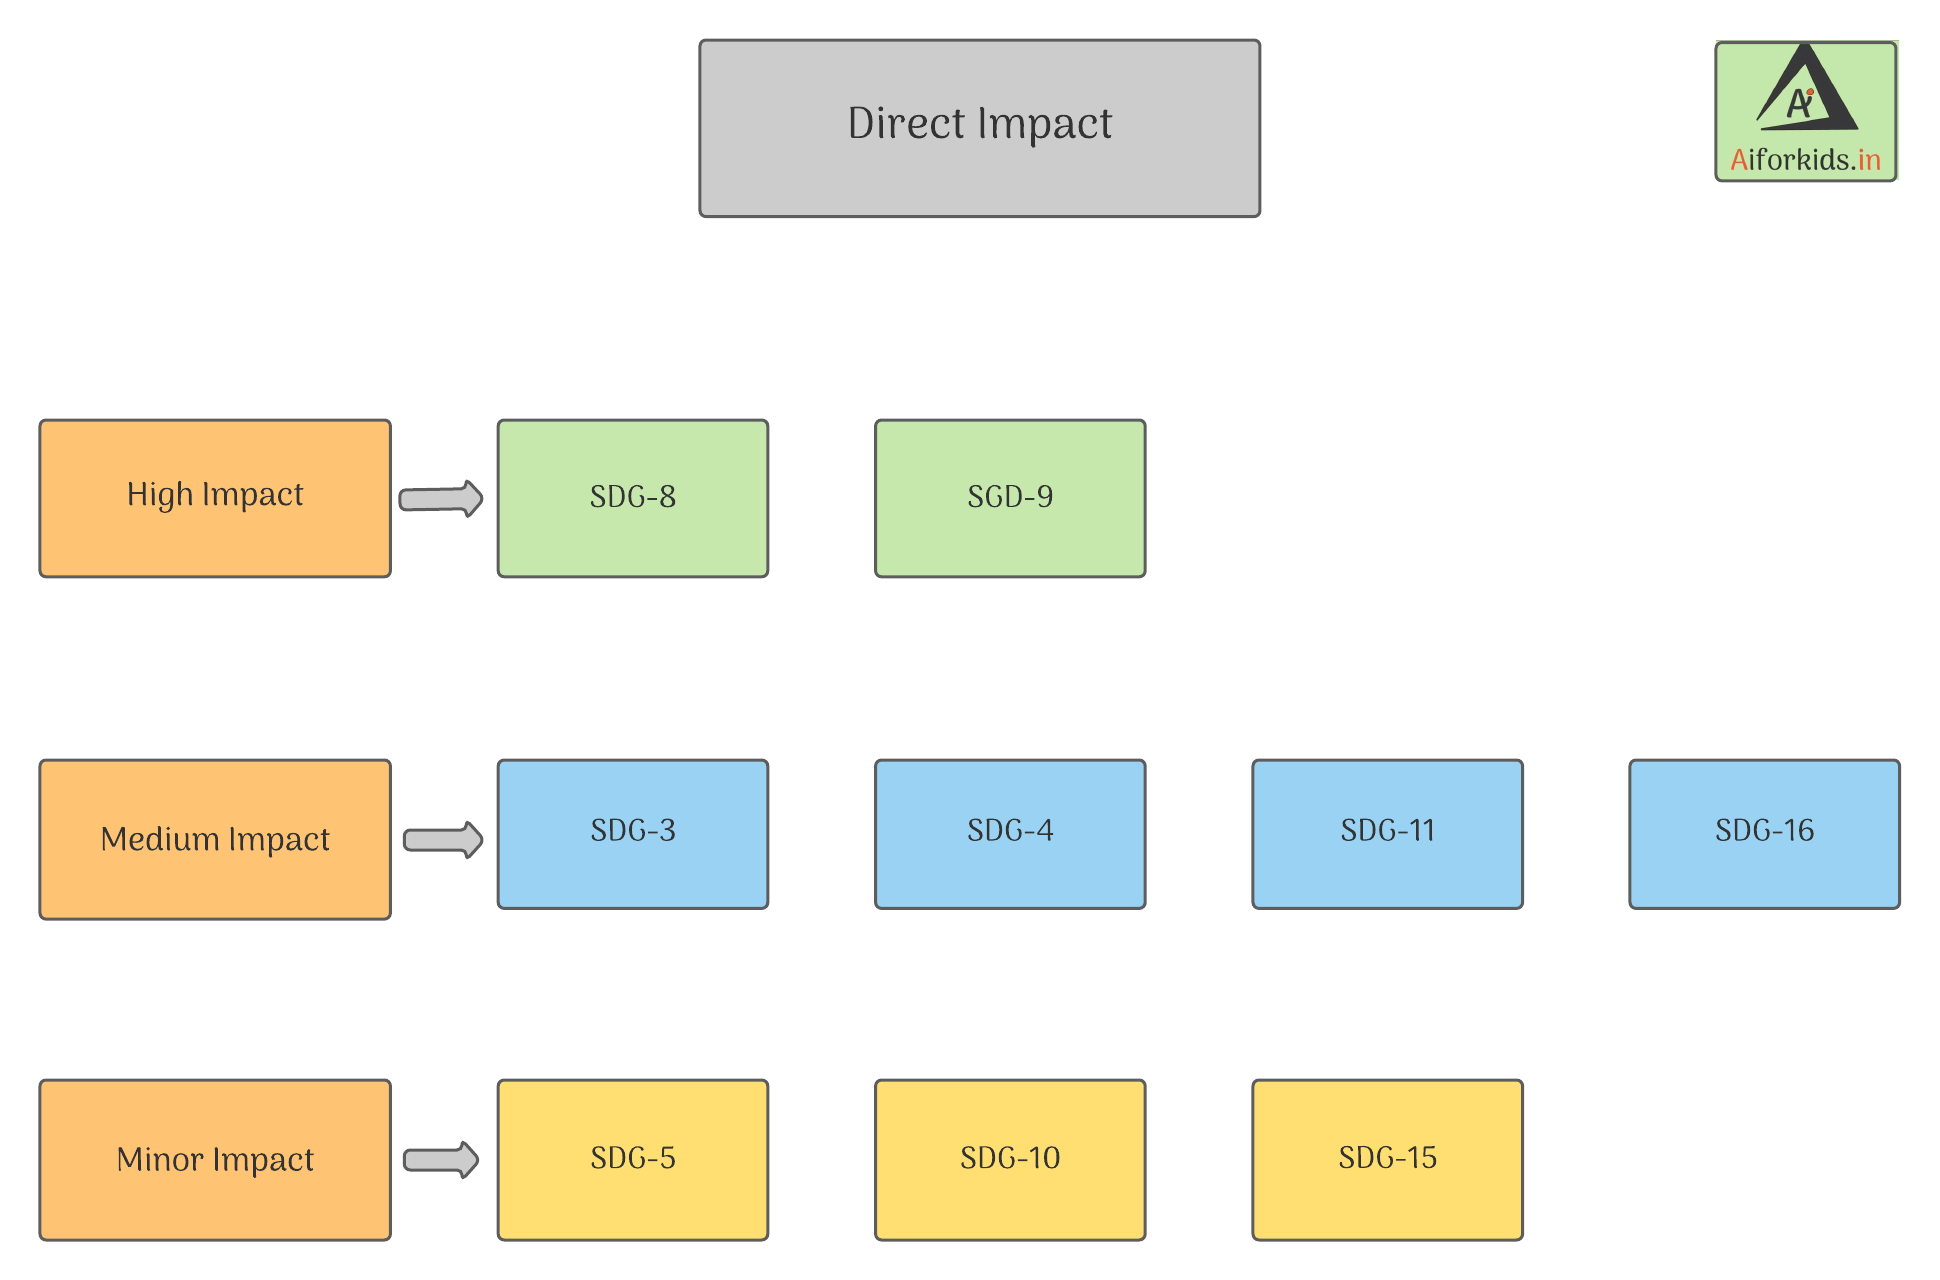 Direct Impact SDG